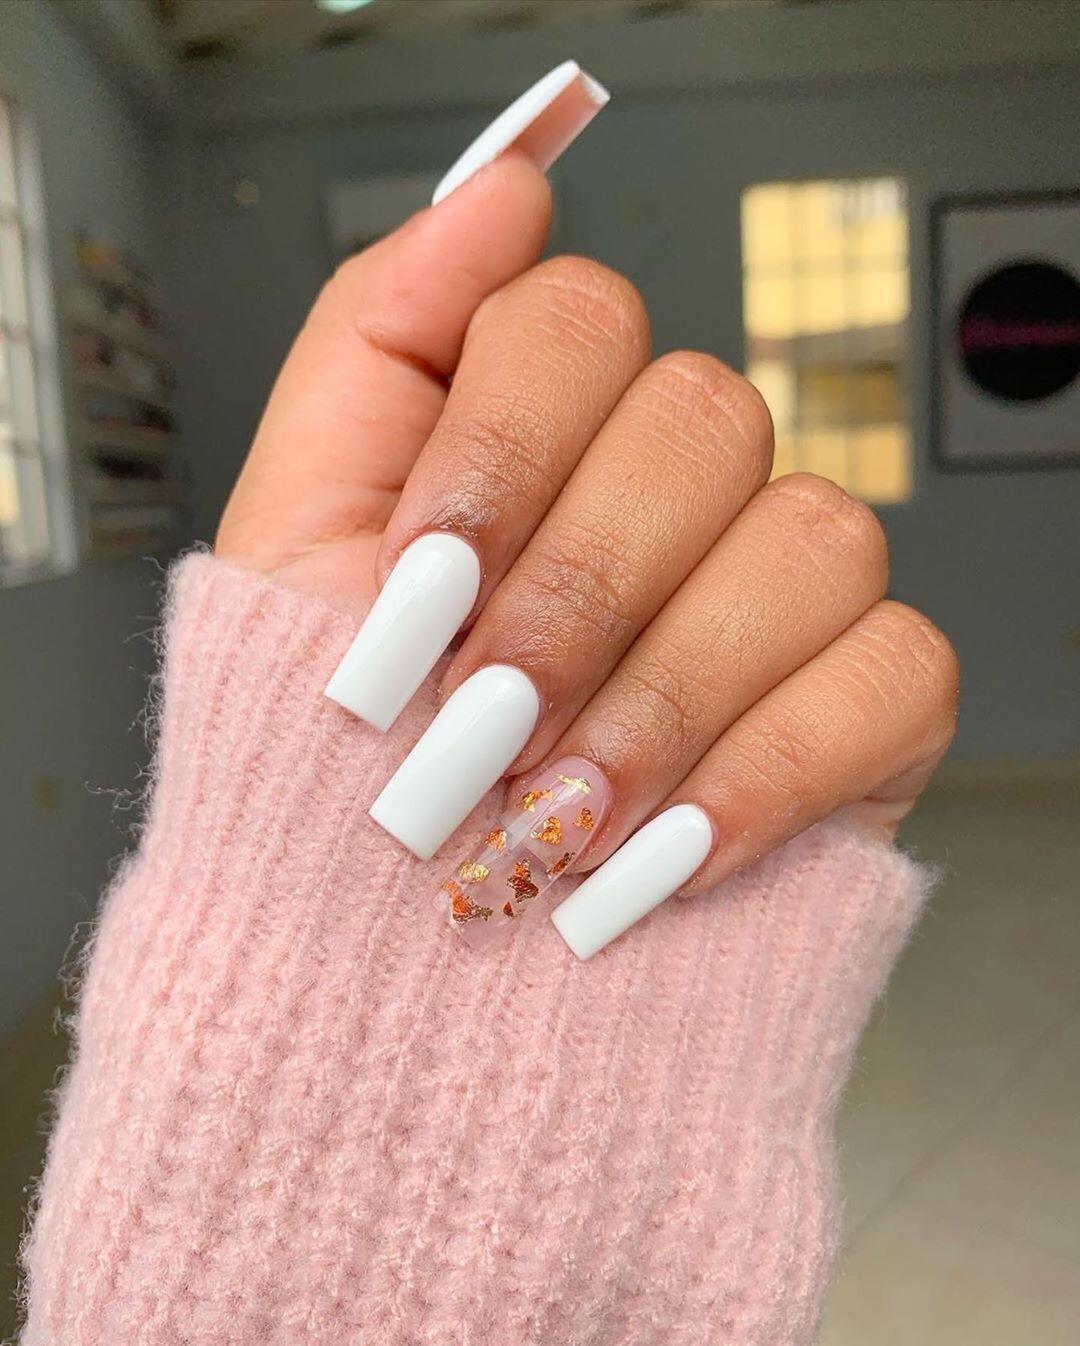 Home Ipl Epilator Laser Hair Removal Handset Use Code Ange20 To Save 20 Off 20 Off Nailart Nail Nailstag In 2020 Long Acrylic Nails Blush Nails Artificial Nails